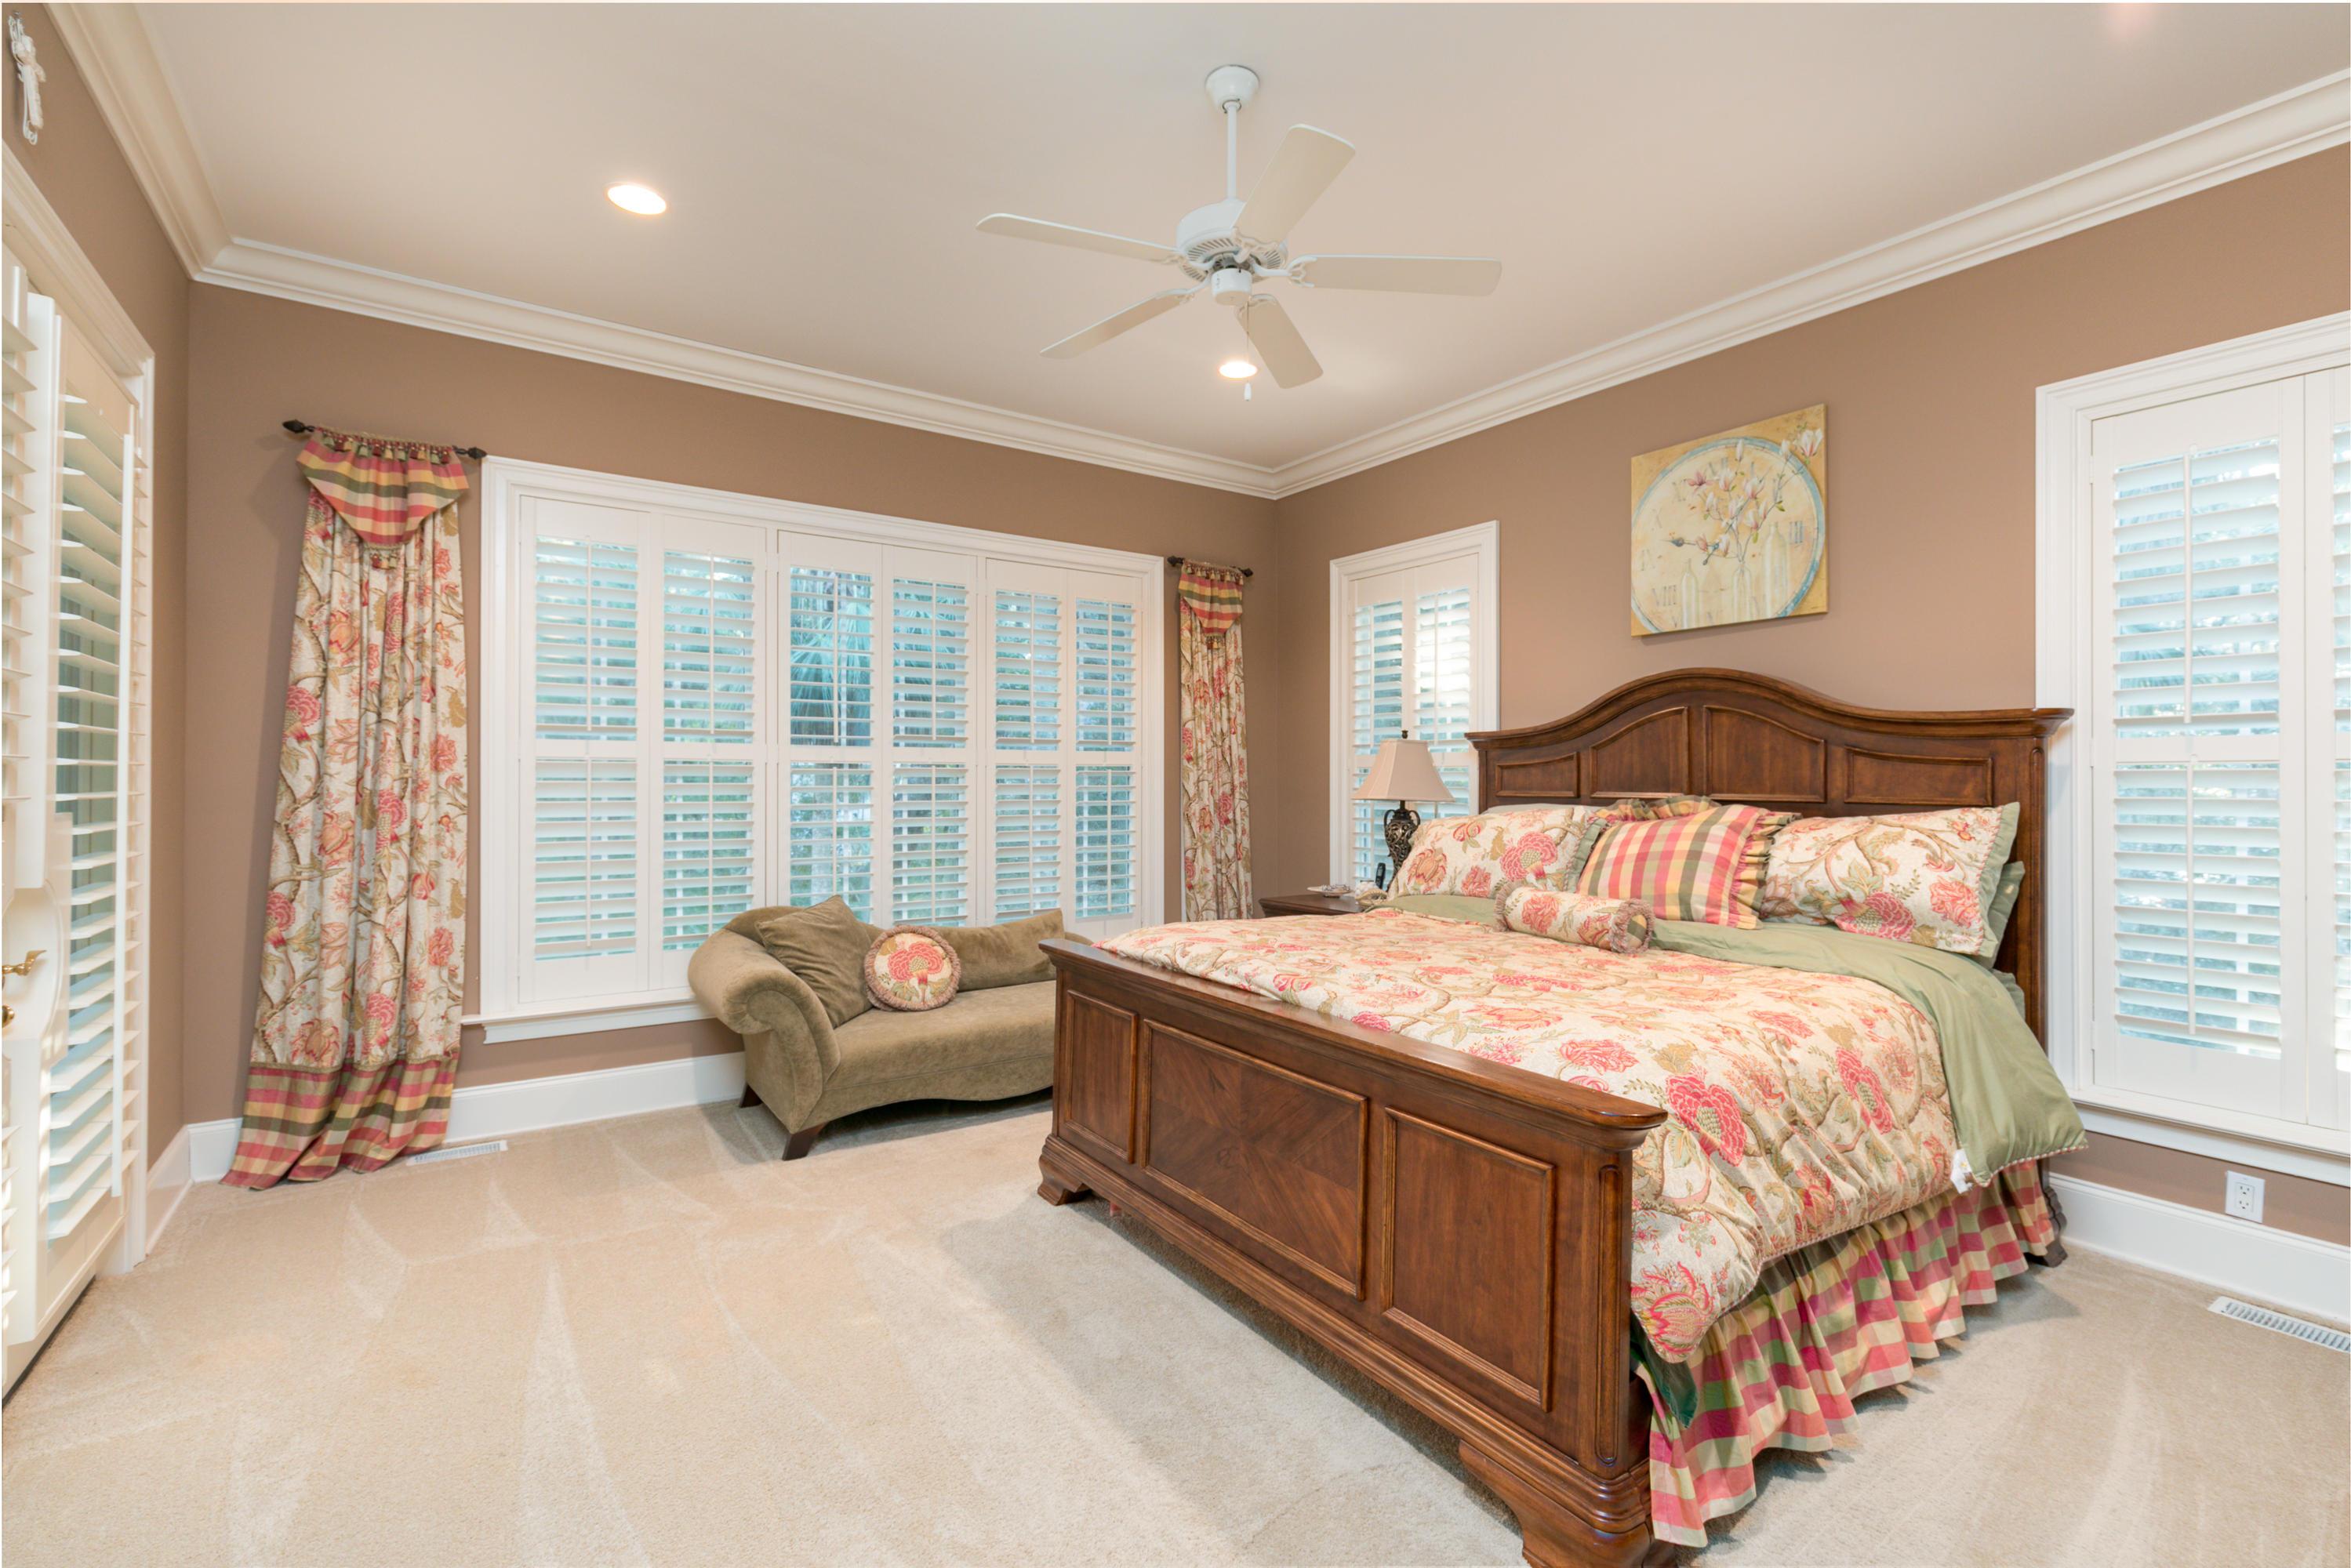 Seabrook Island Homes For Sale - 2701 Seabrook Island, Seabrook Island, SC - 31